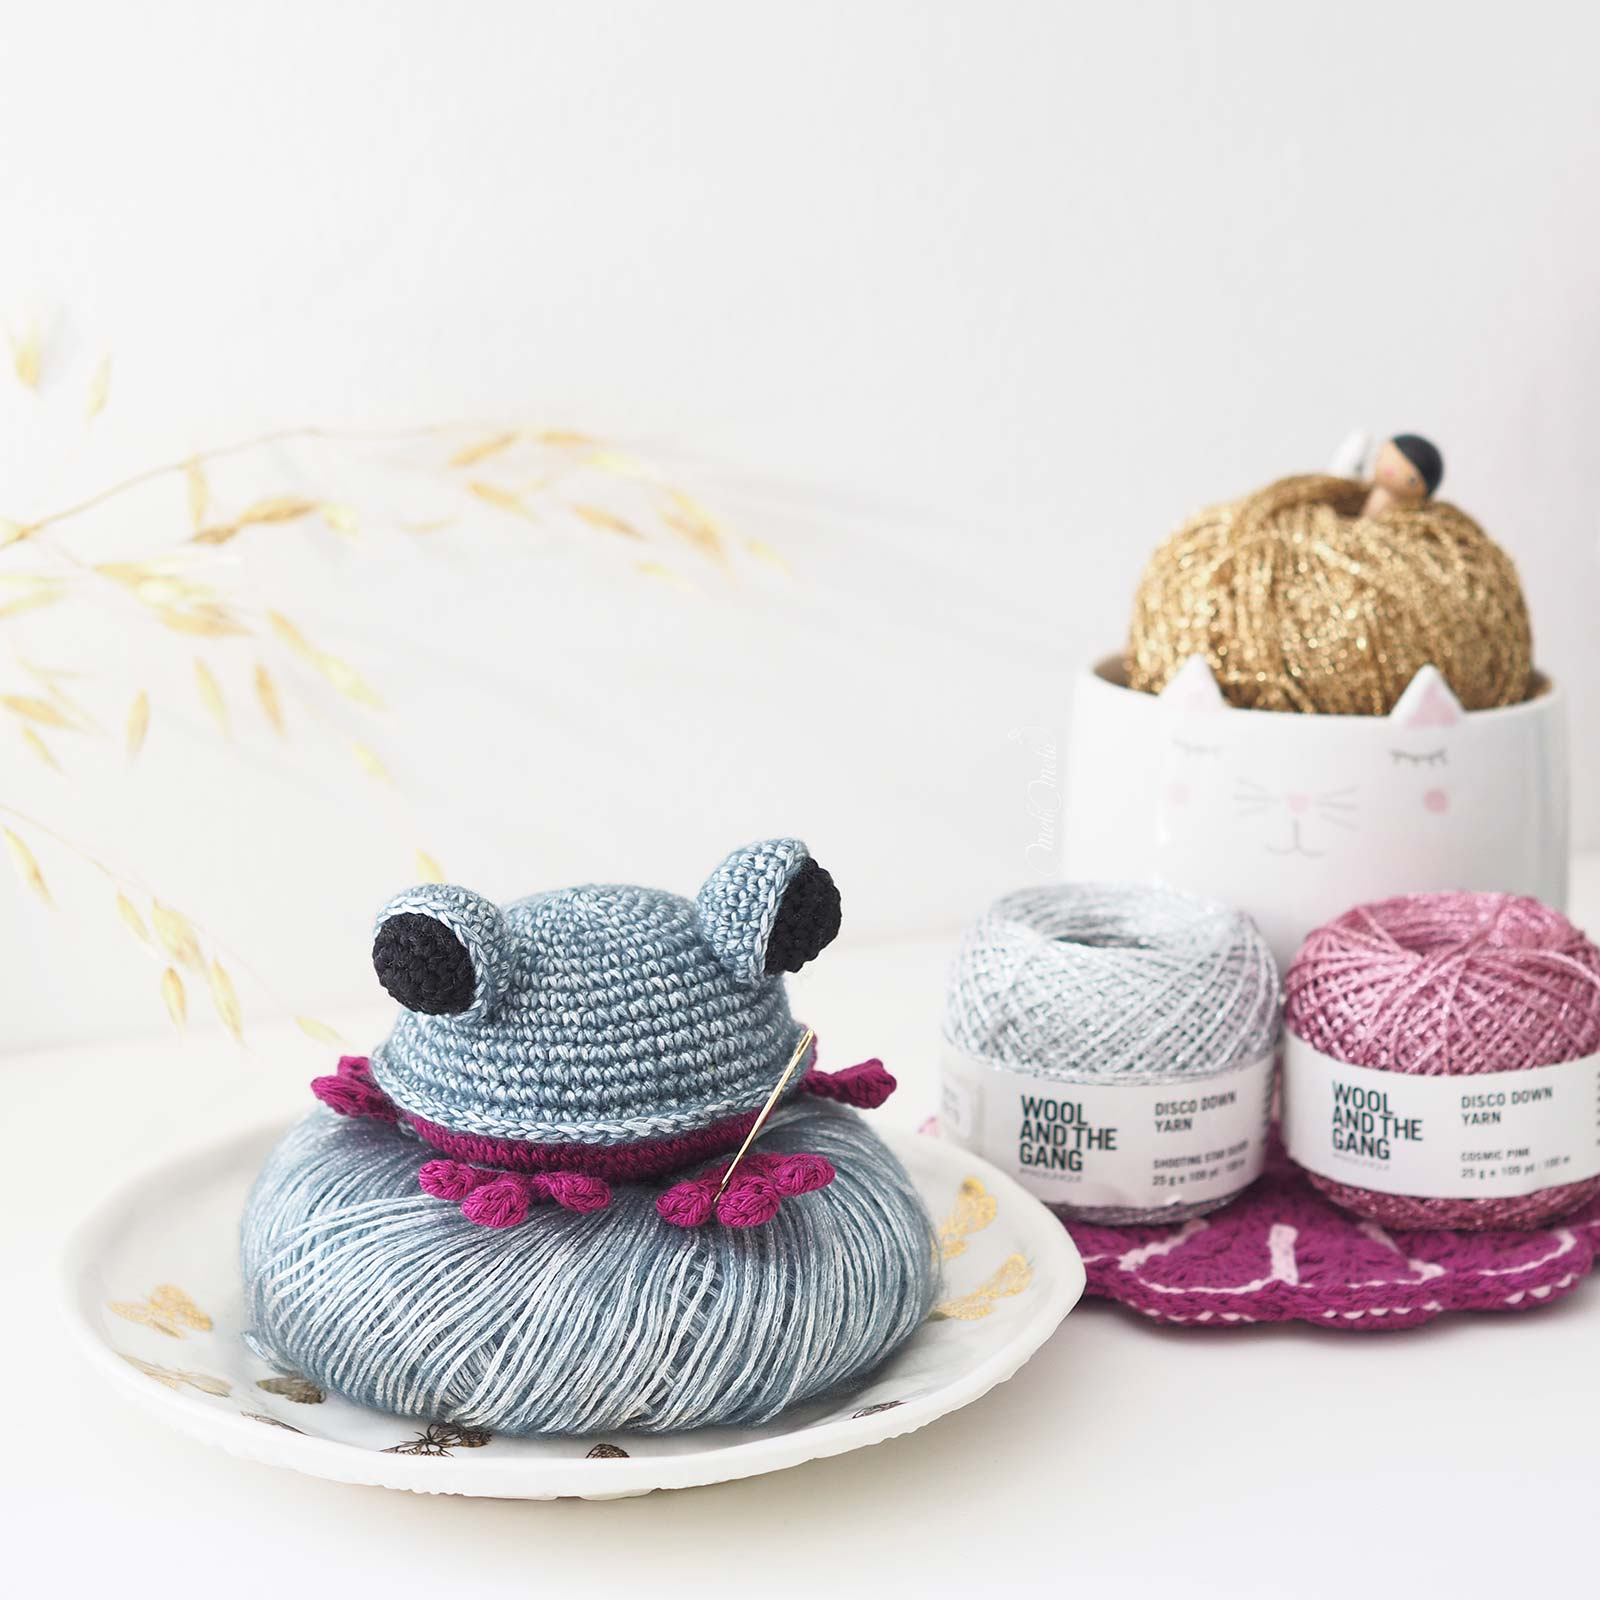 crochet-amigurumi-grenouille-frog-juliaka-toys-disco-down-woolandthegang-laboutiquedemelimelo